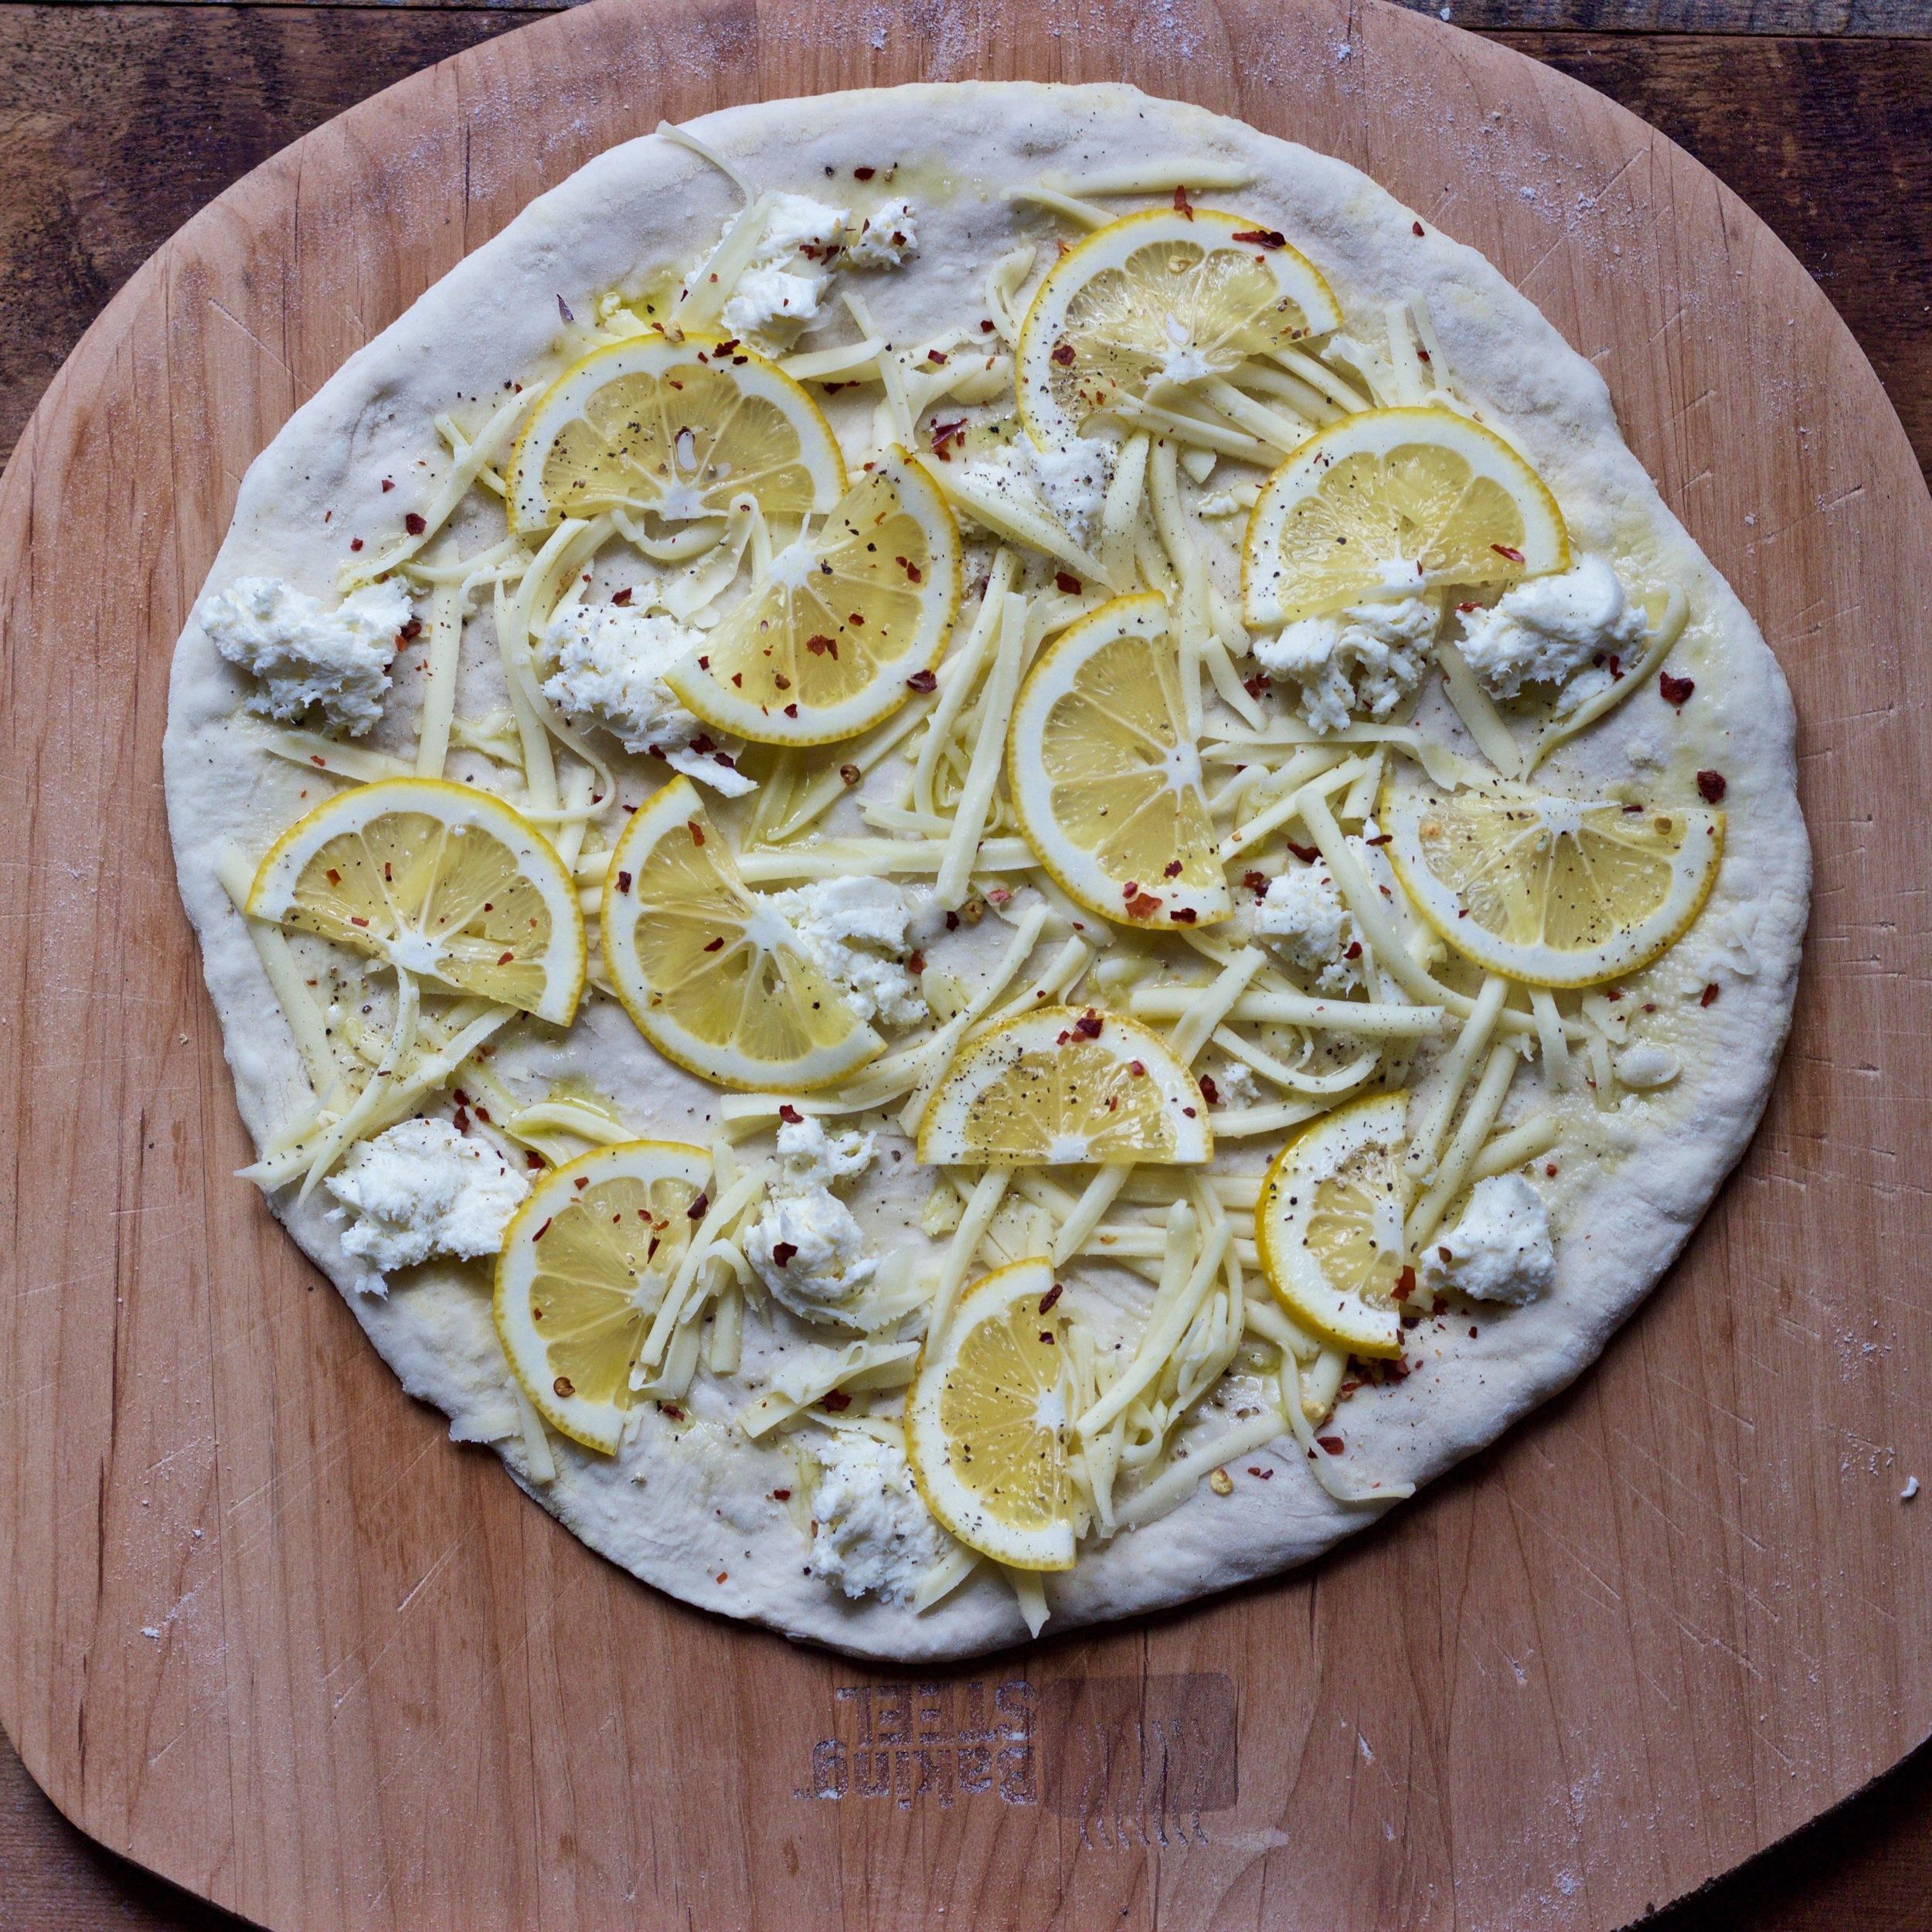 lemon and kale pizza